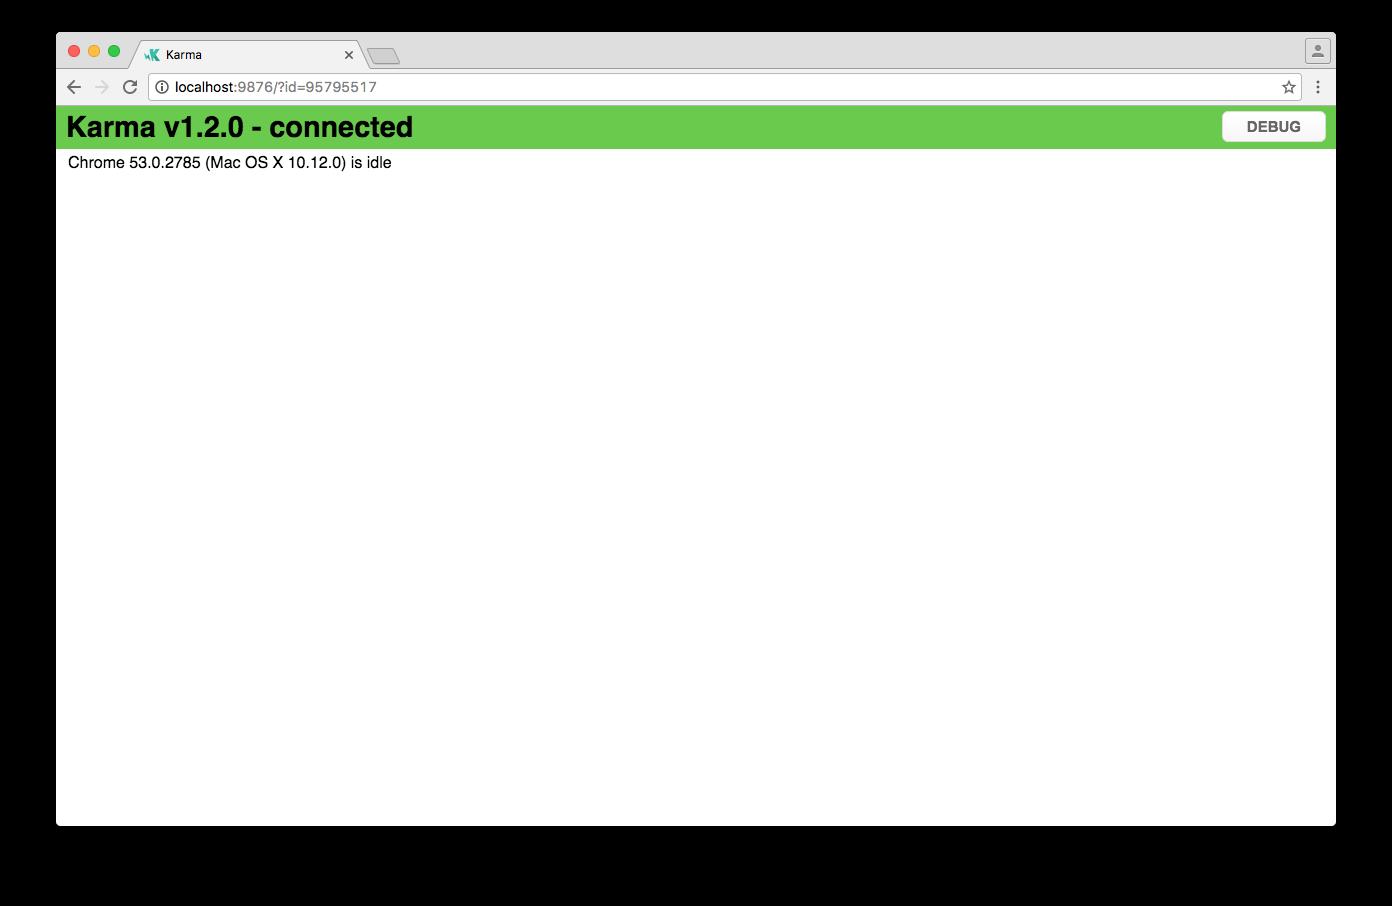 Angular CLI: Browser window showing the Karma test runner screen